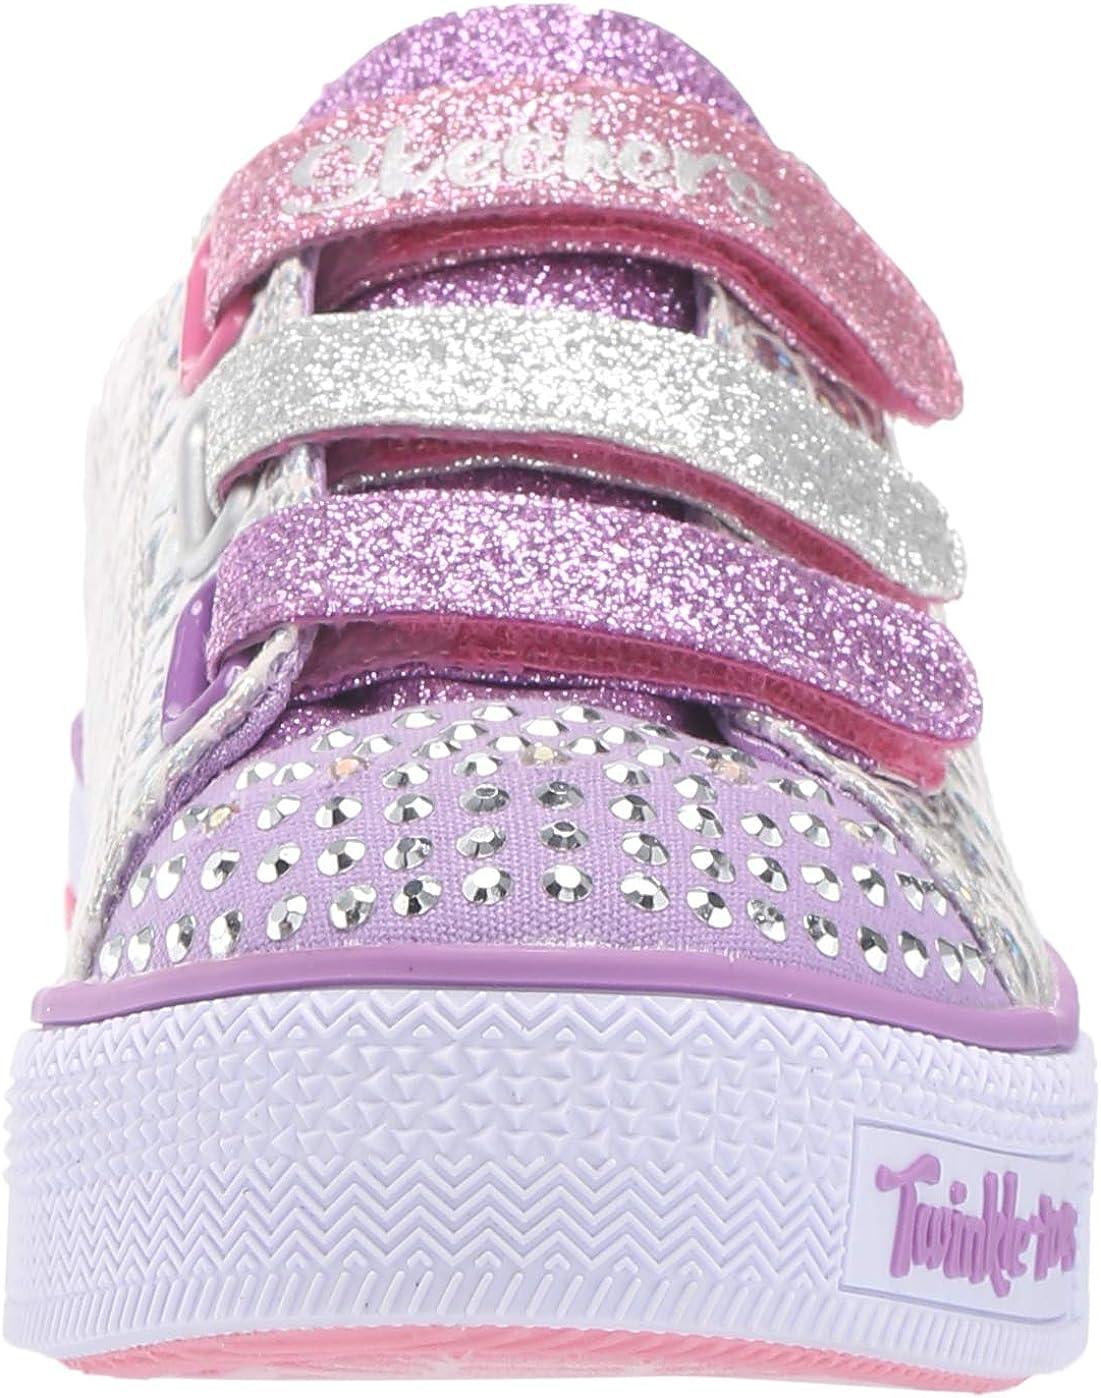 28.5 Twinkle Lite-Sparkle Scales Smlt Skechers